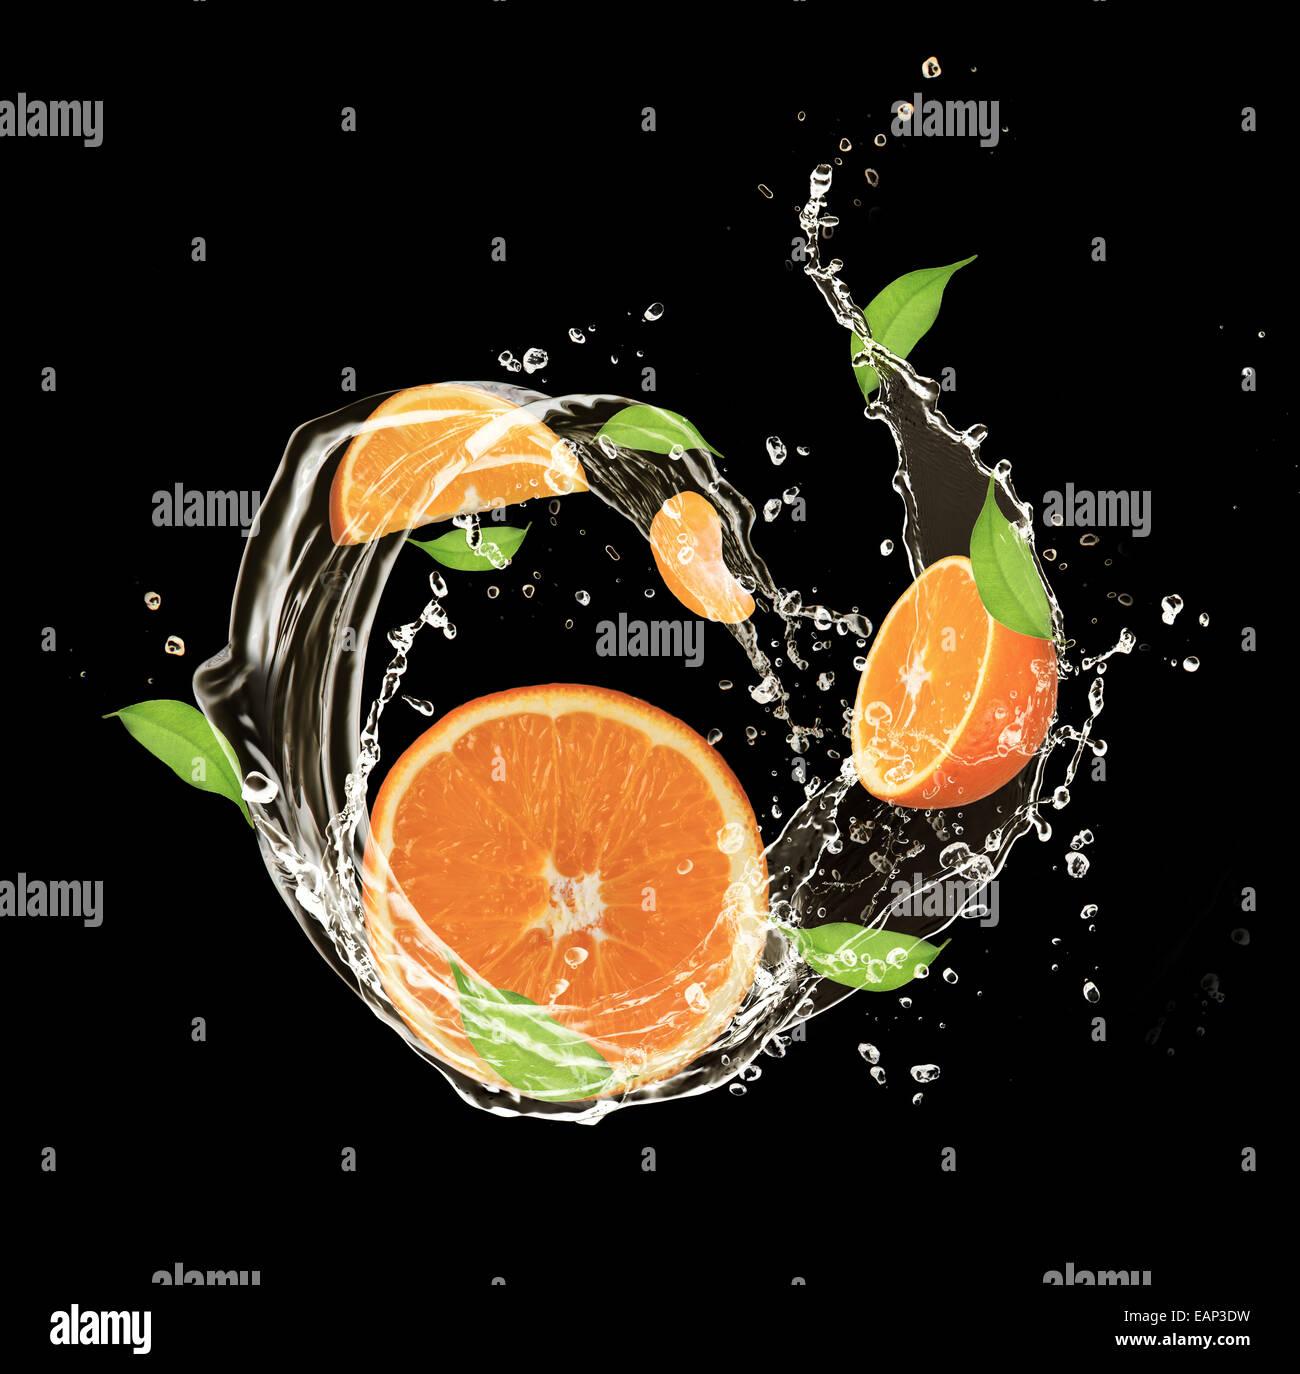 Fresh oranges in water splash, isolated on black background - Stock Image